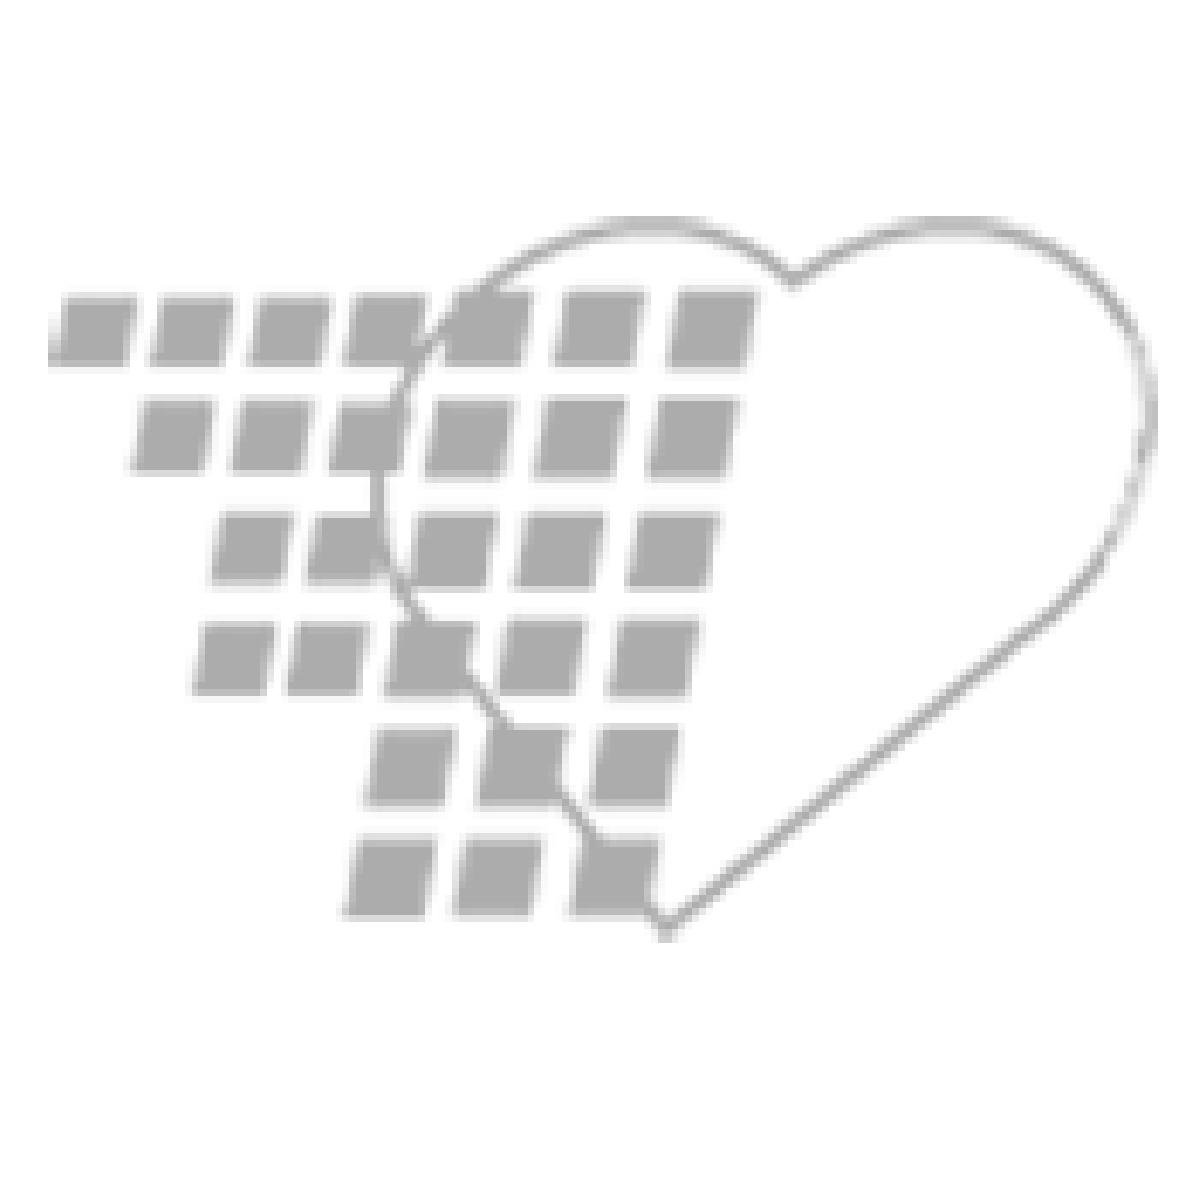 11-81-1144 Life/form® Additional Auscultation Smartscope™